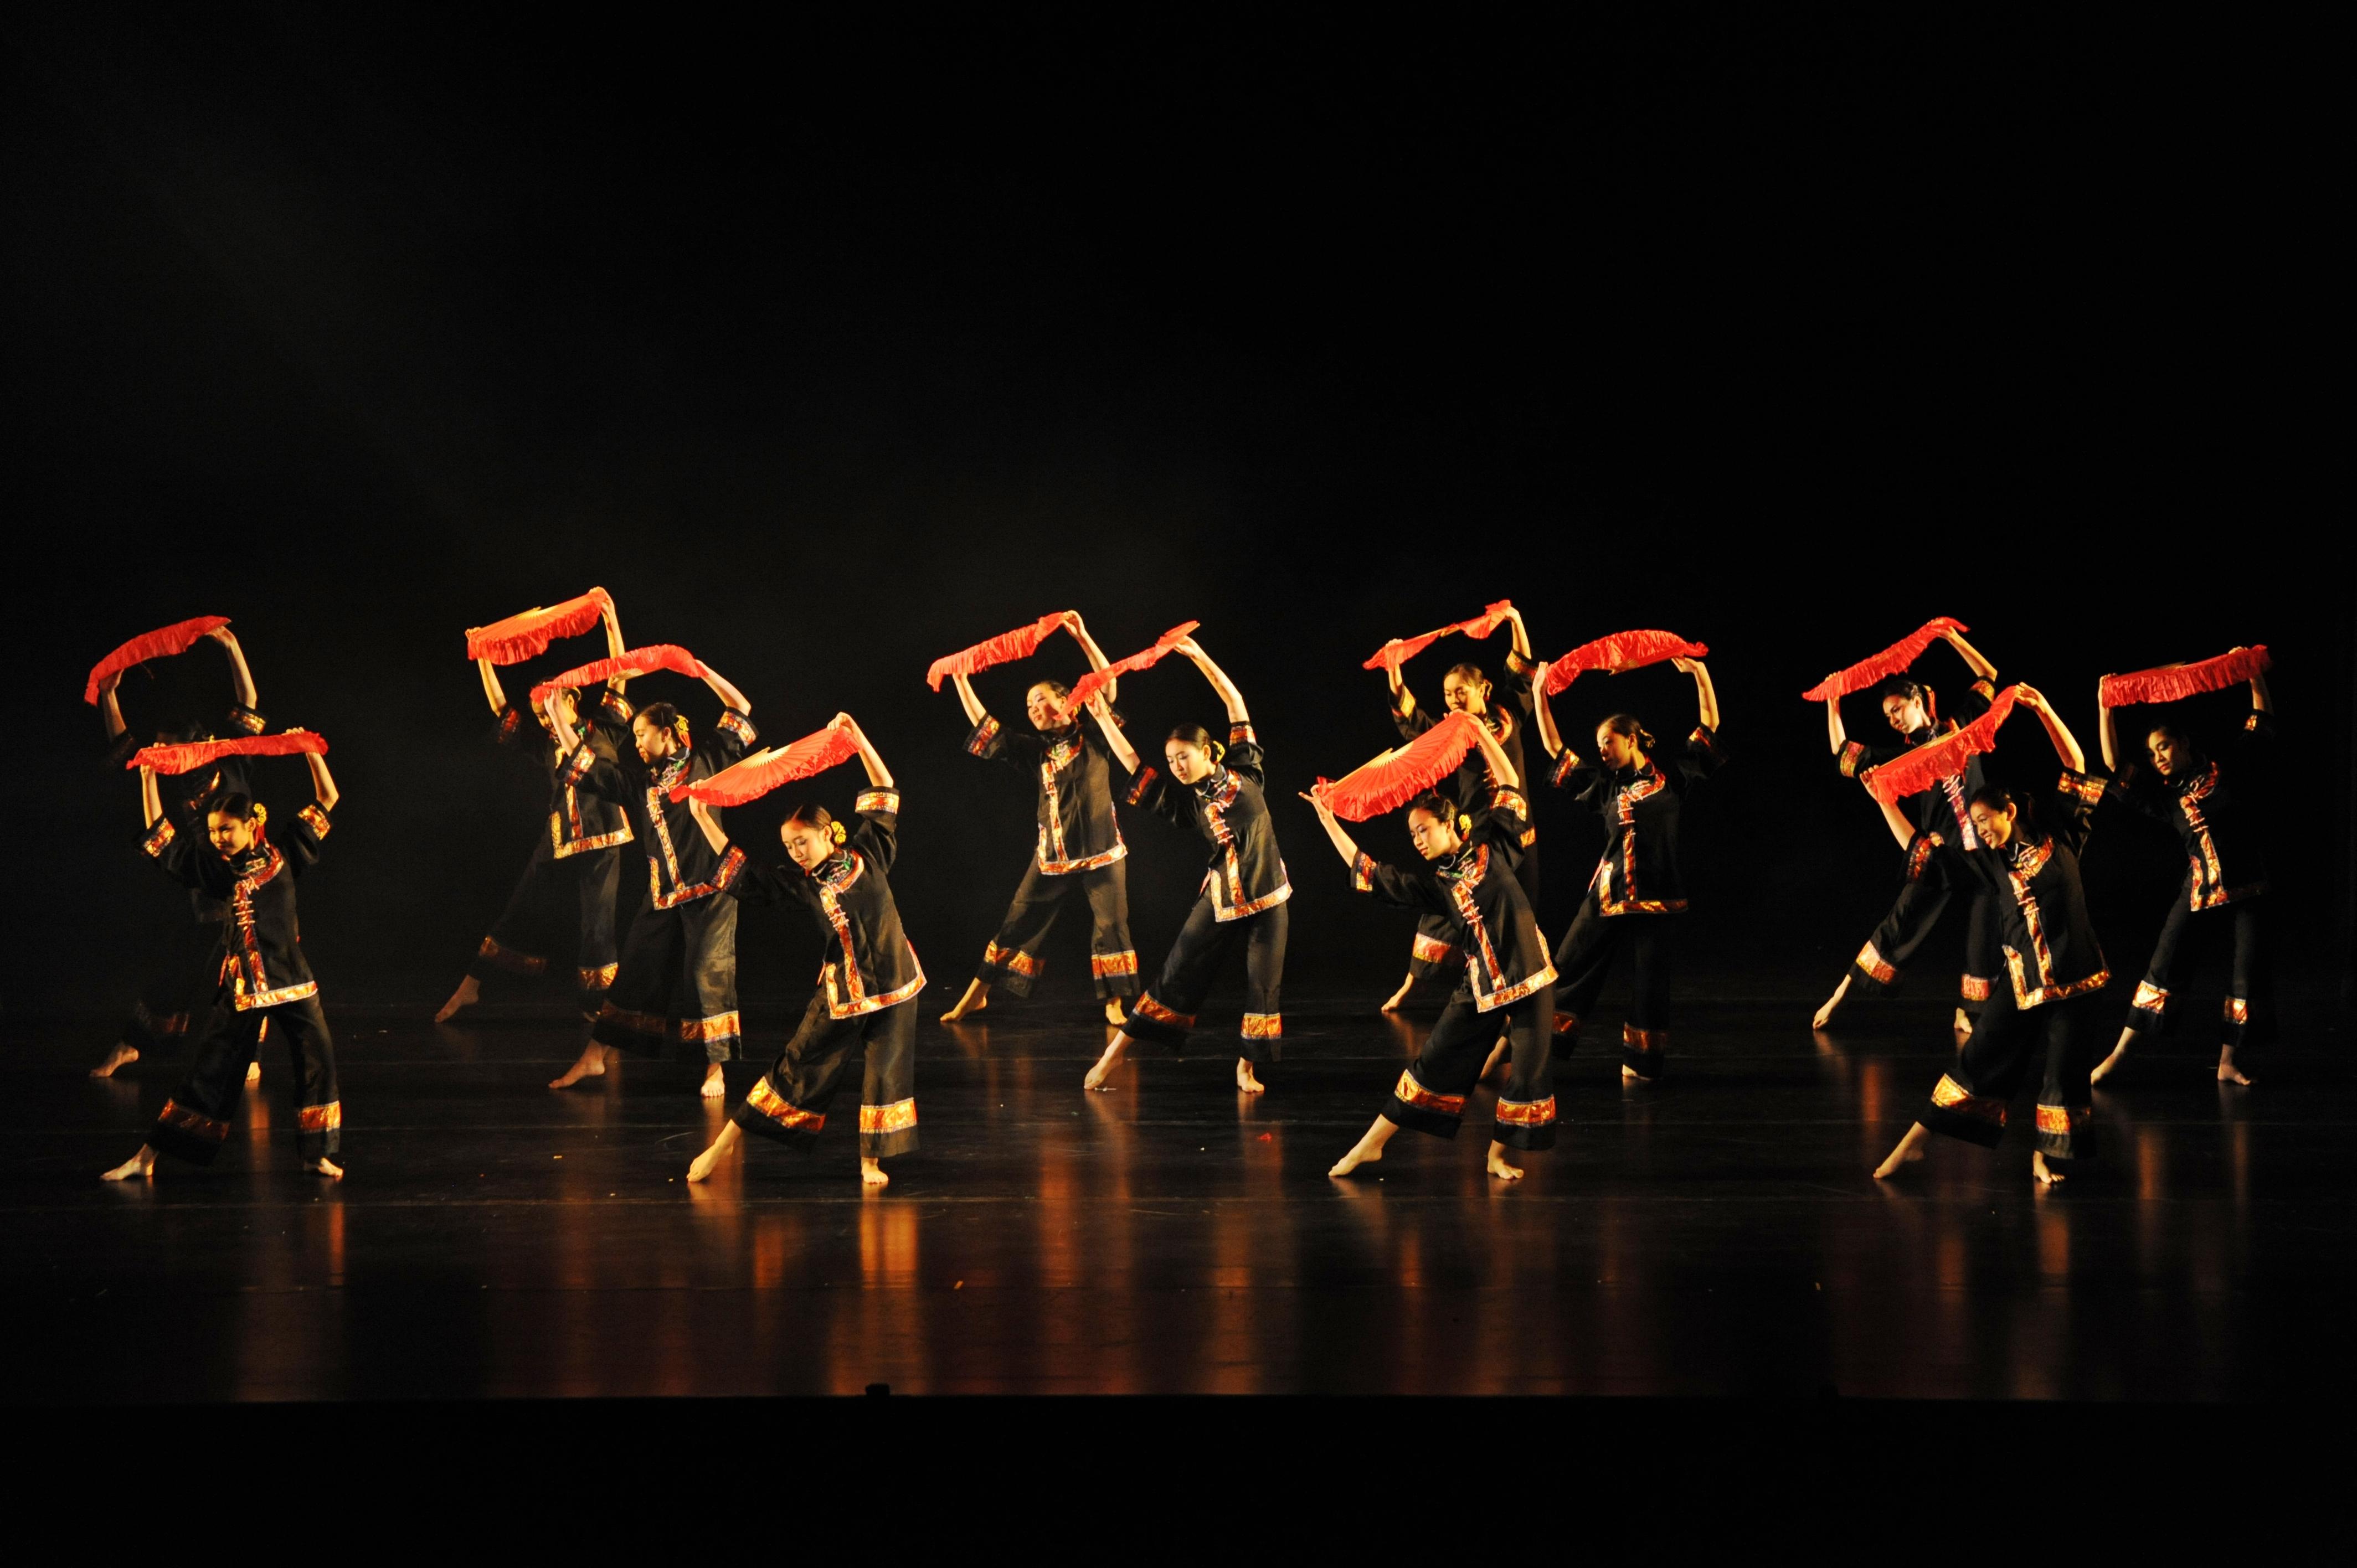 https://hkcchoir.org/sites/default/files/youth_dance_2016wu_yuan_chuan_cheng_1.jpg